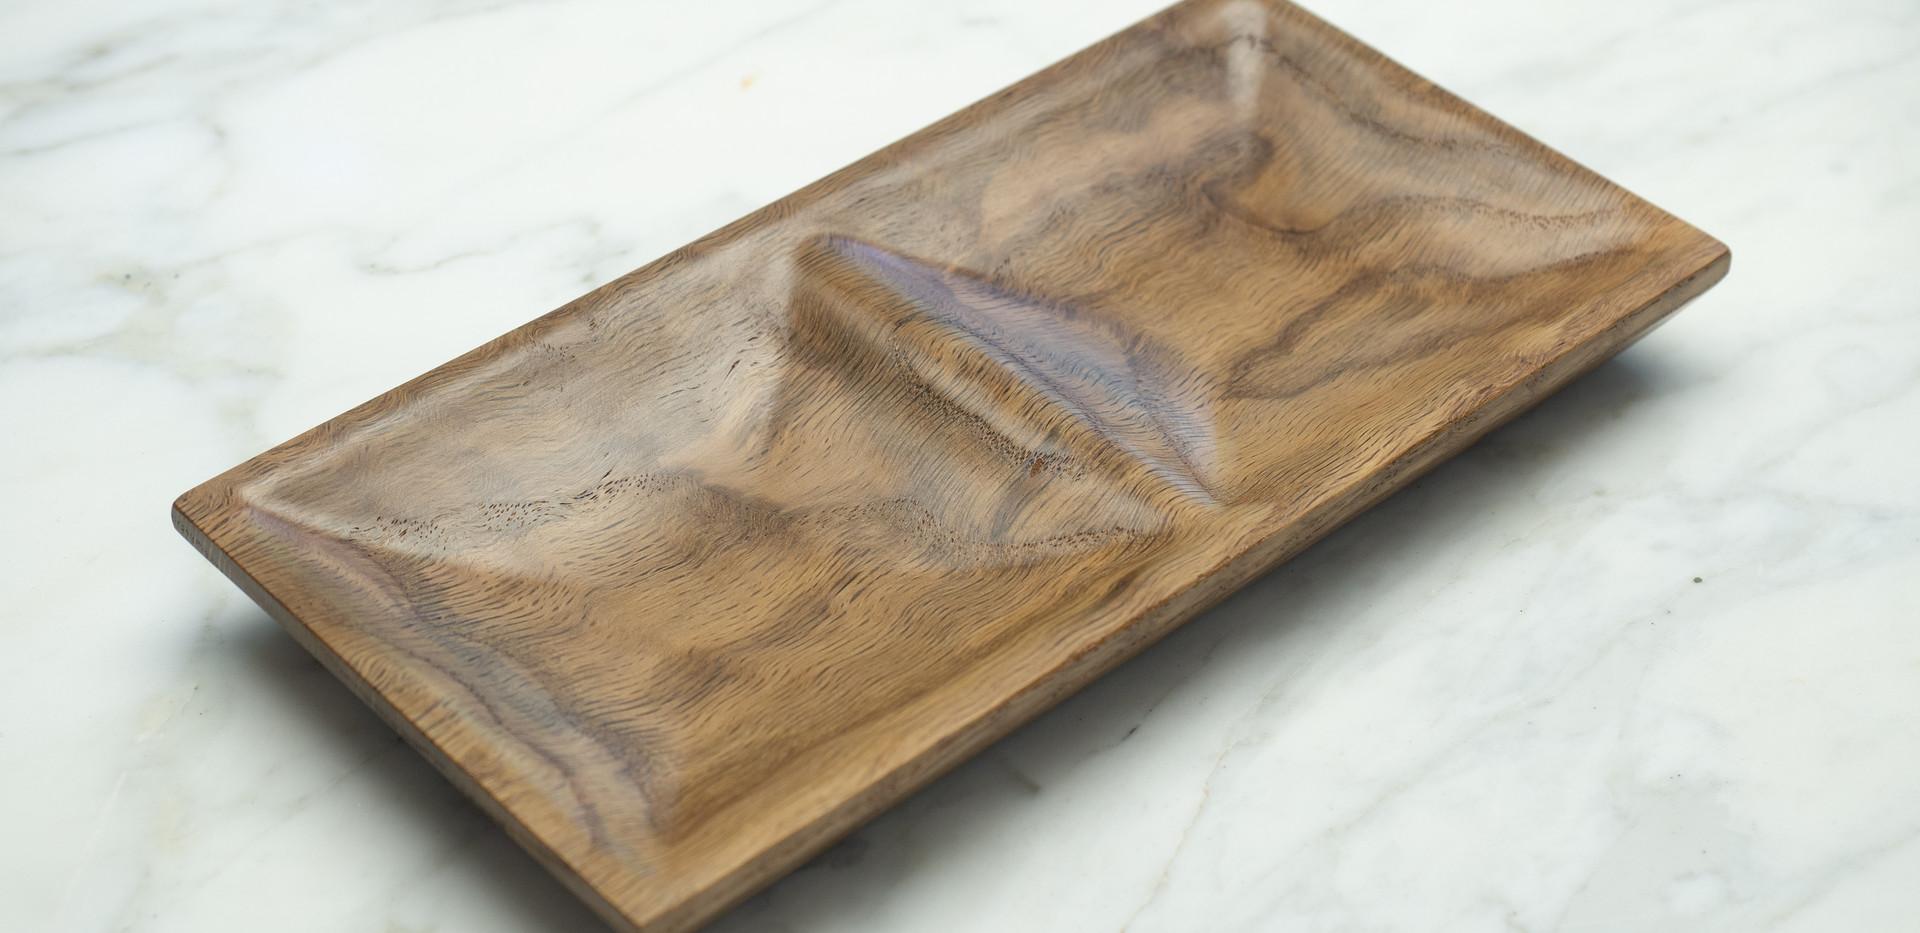 Curly Oak Jewelry Dish